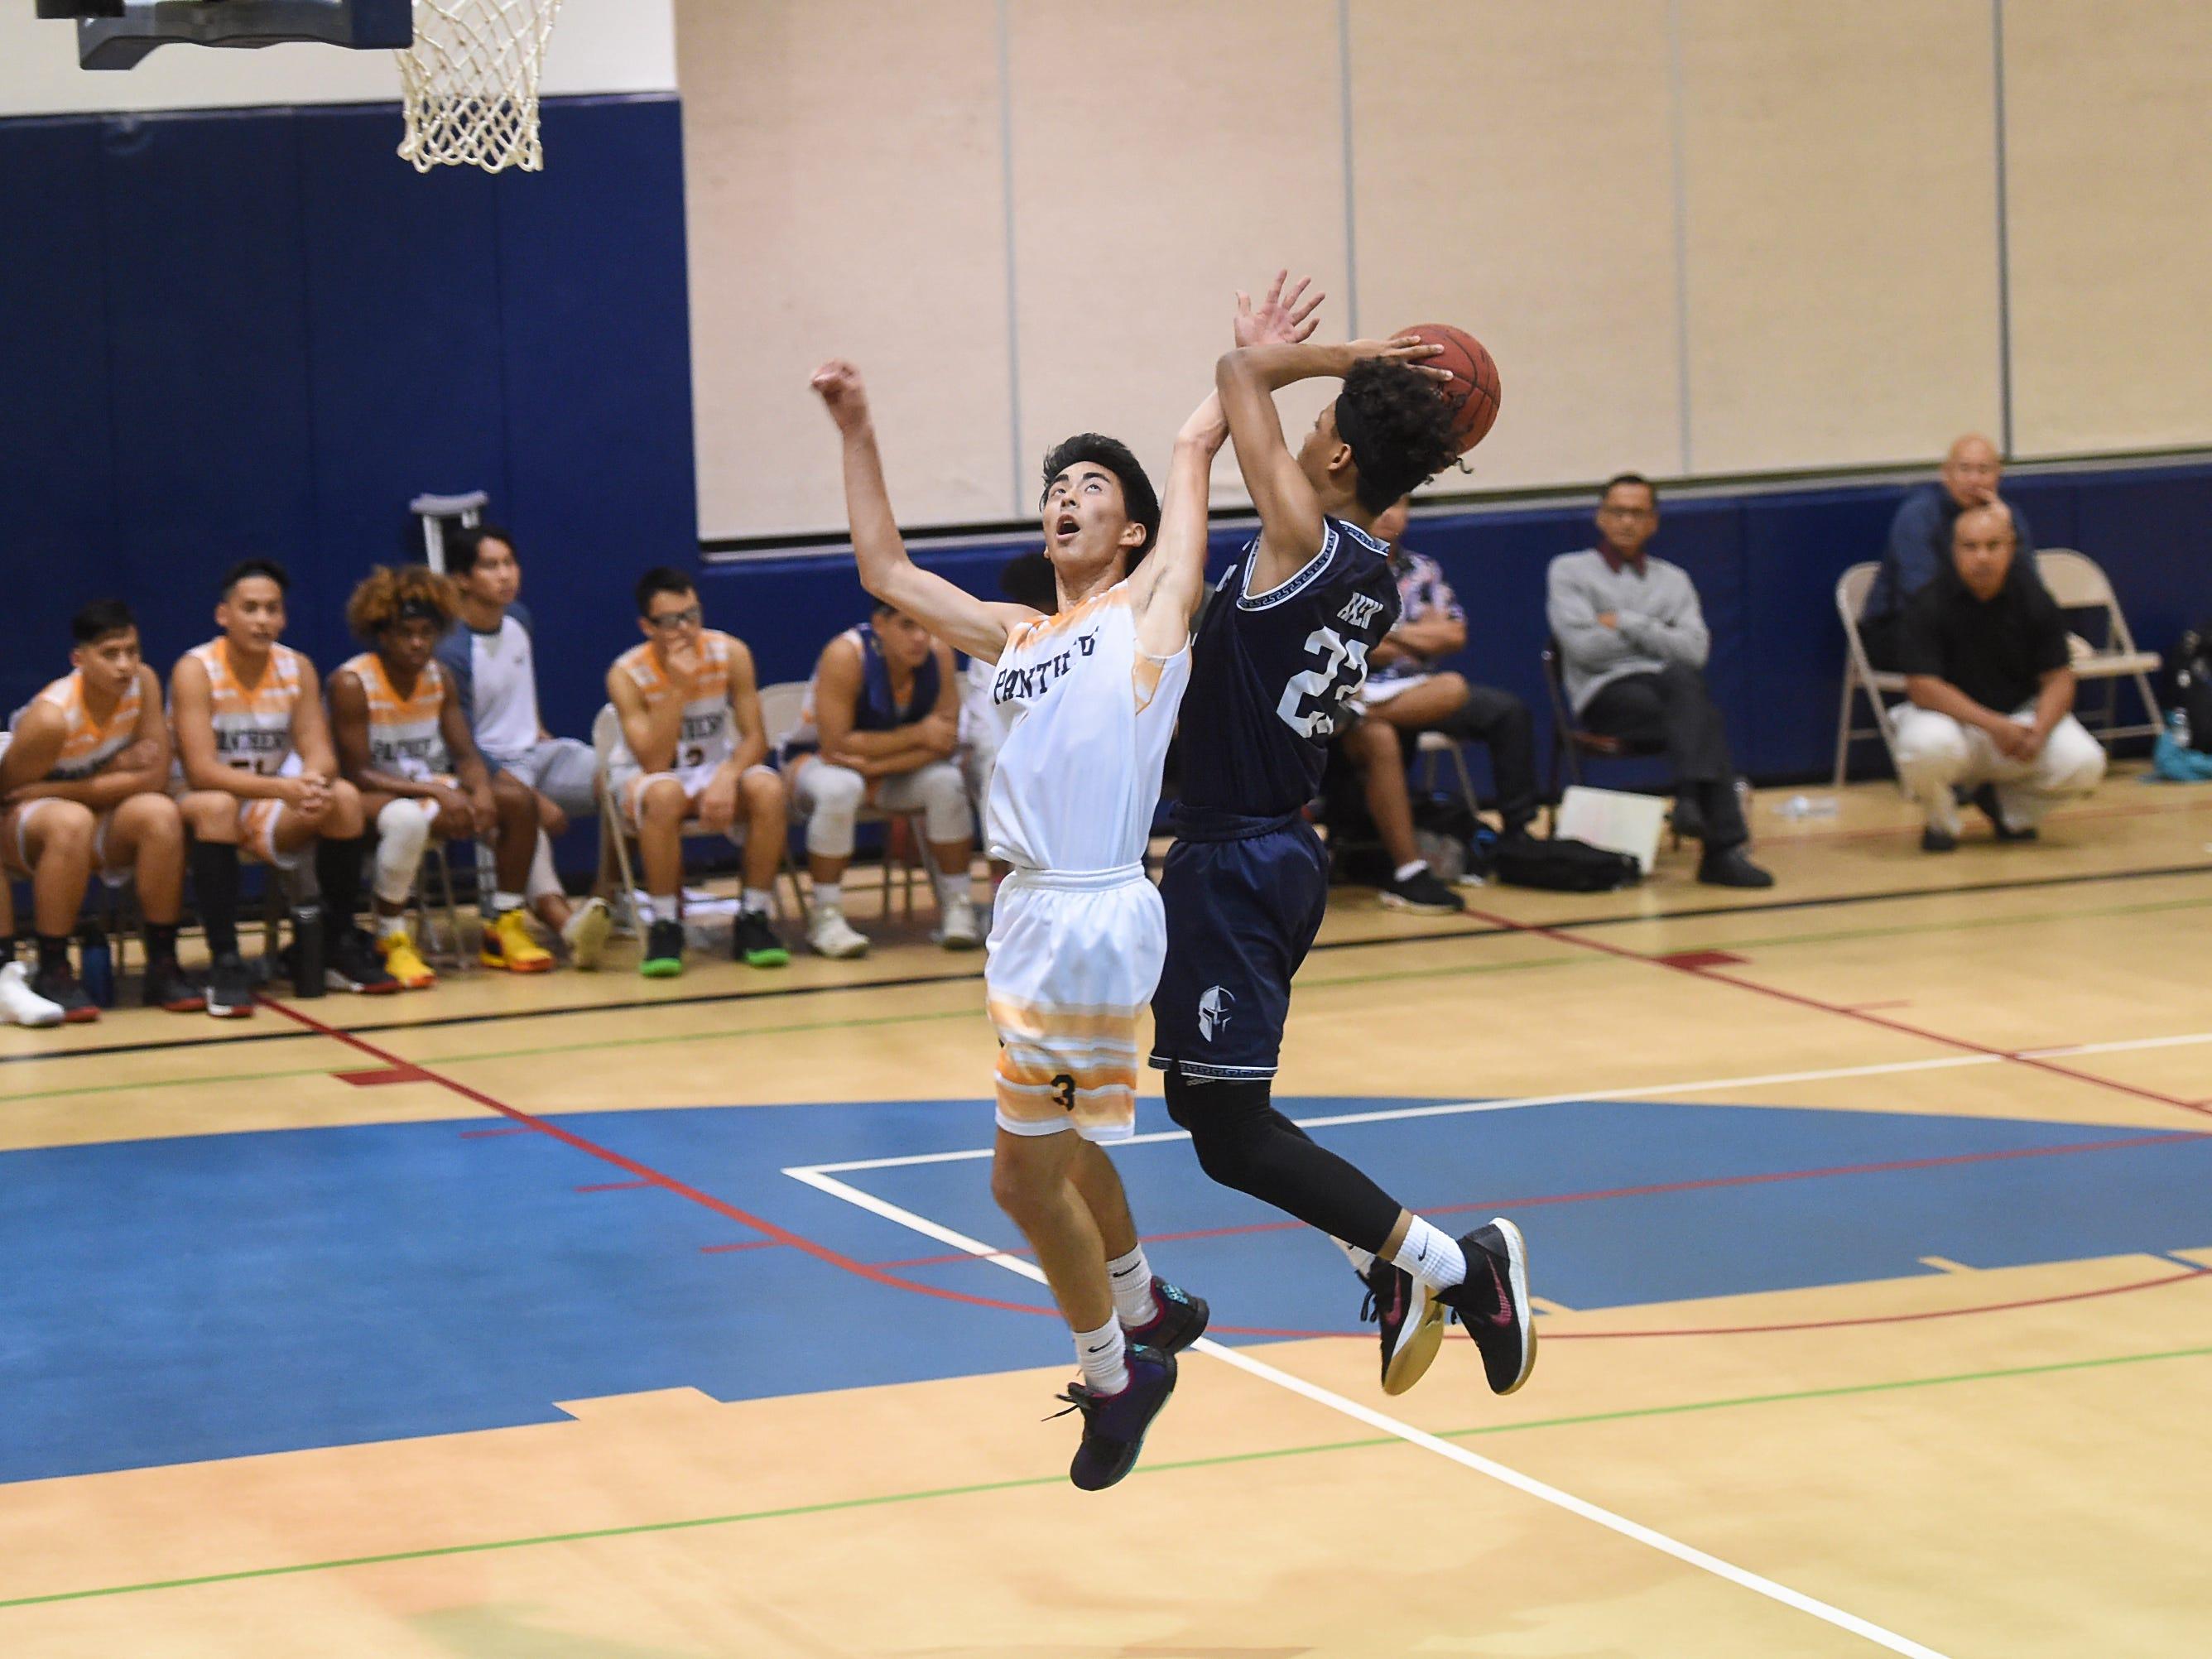 St. Paul's Reo Aiken (23) adjusts his shot on a fast break layup against a Guam High player during their IIAAG Boys' Basketball game at the Guam High School Gym, Feb. 5, 2019.